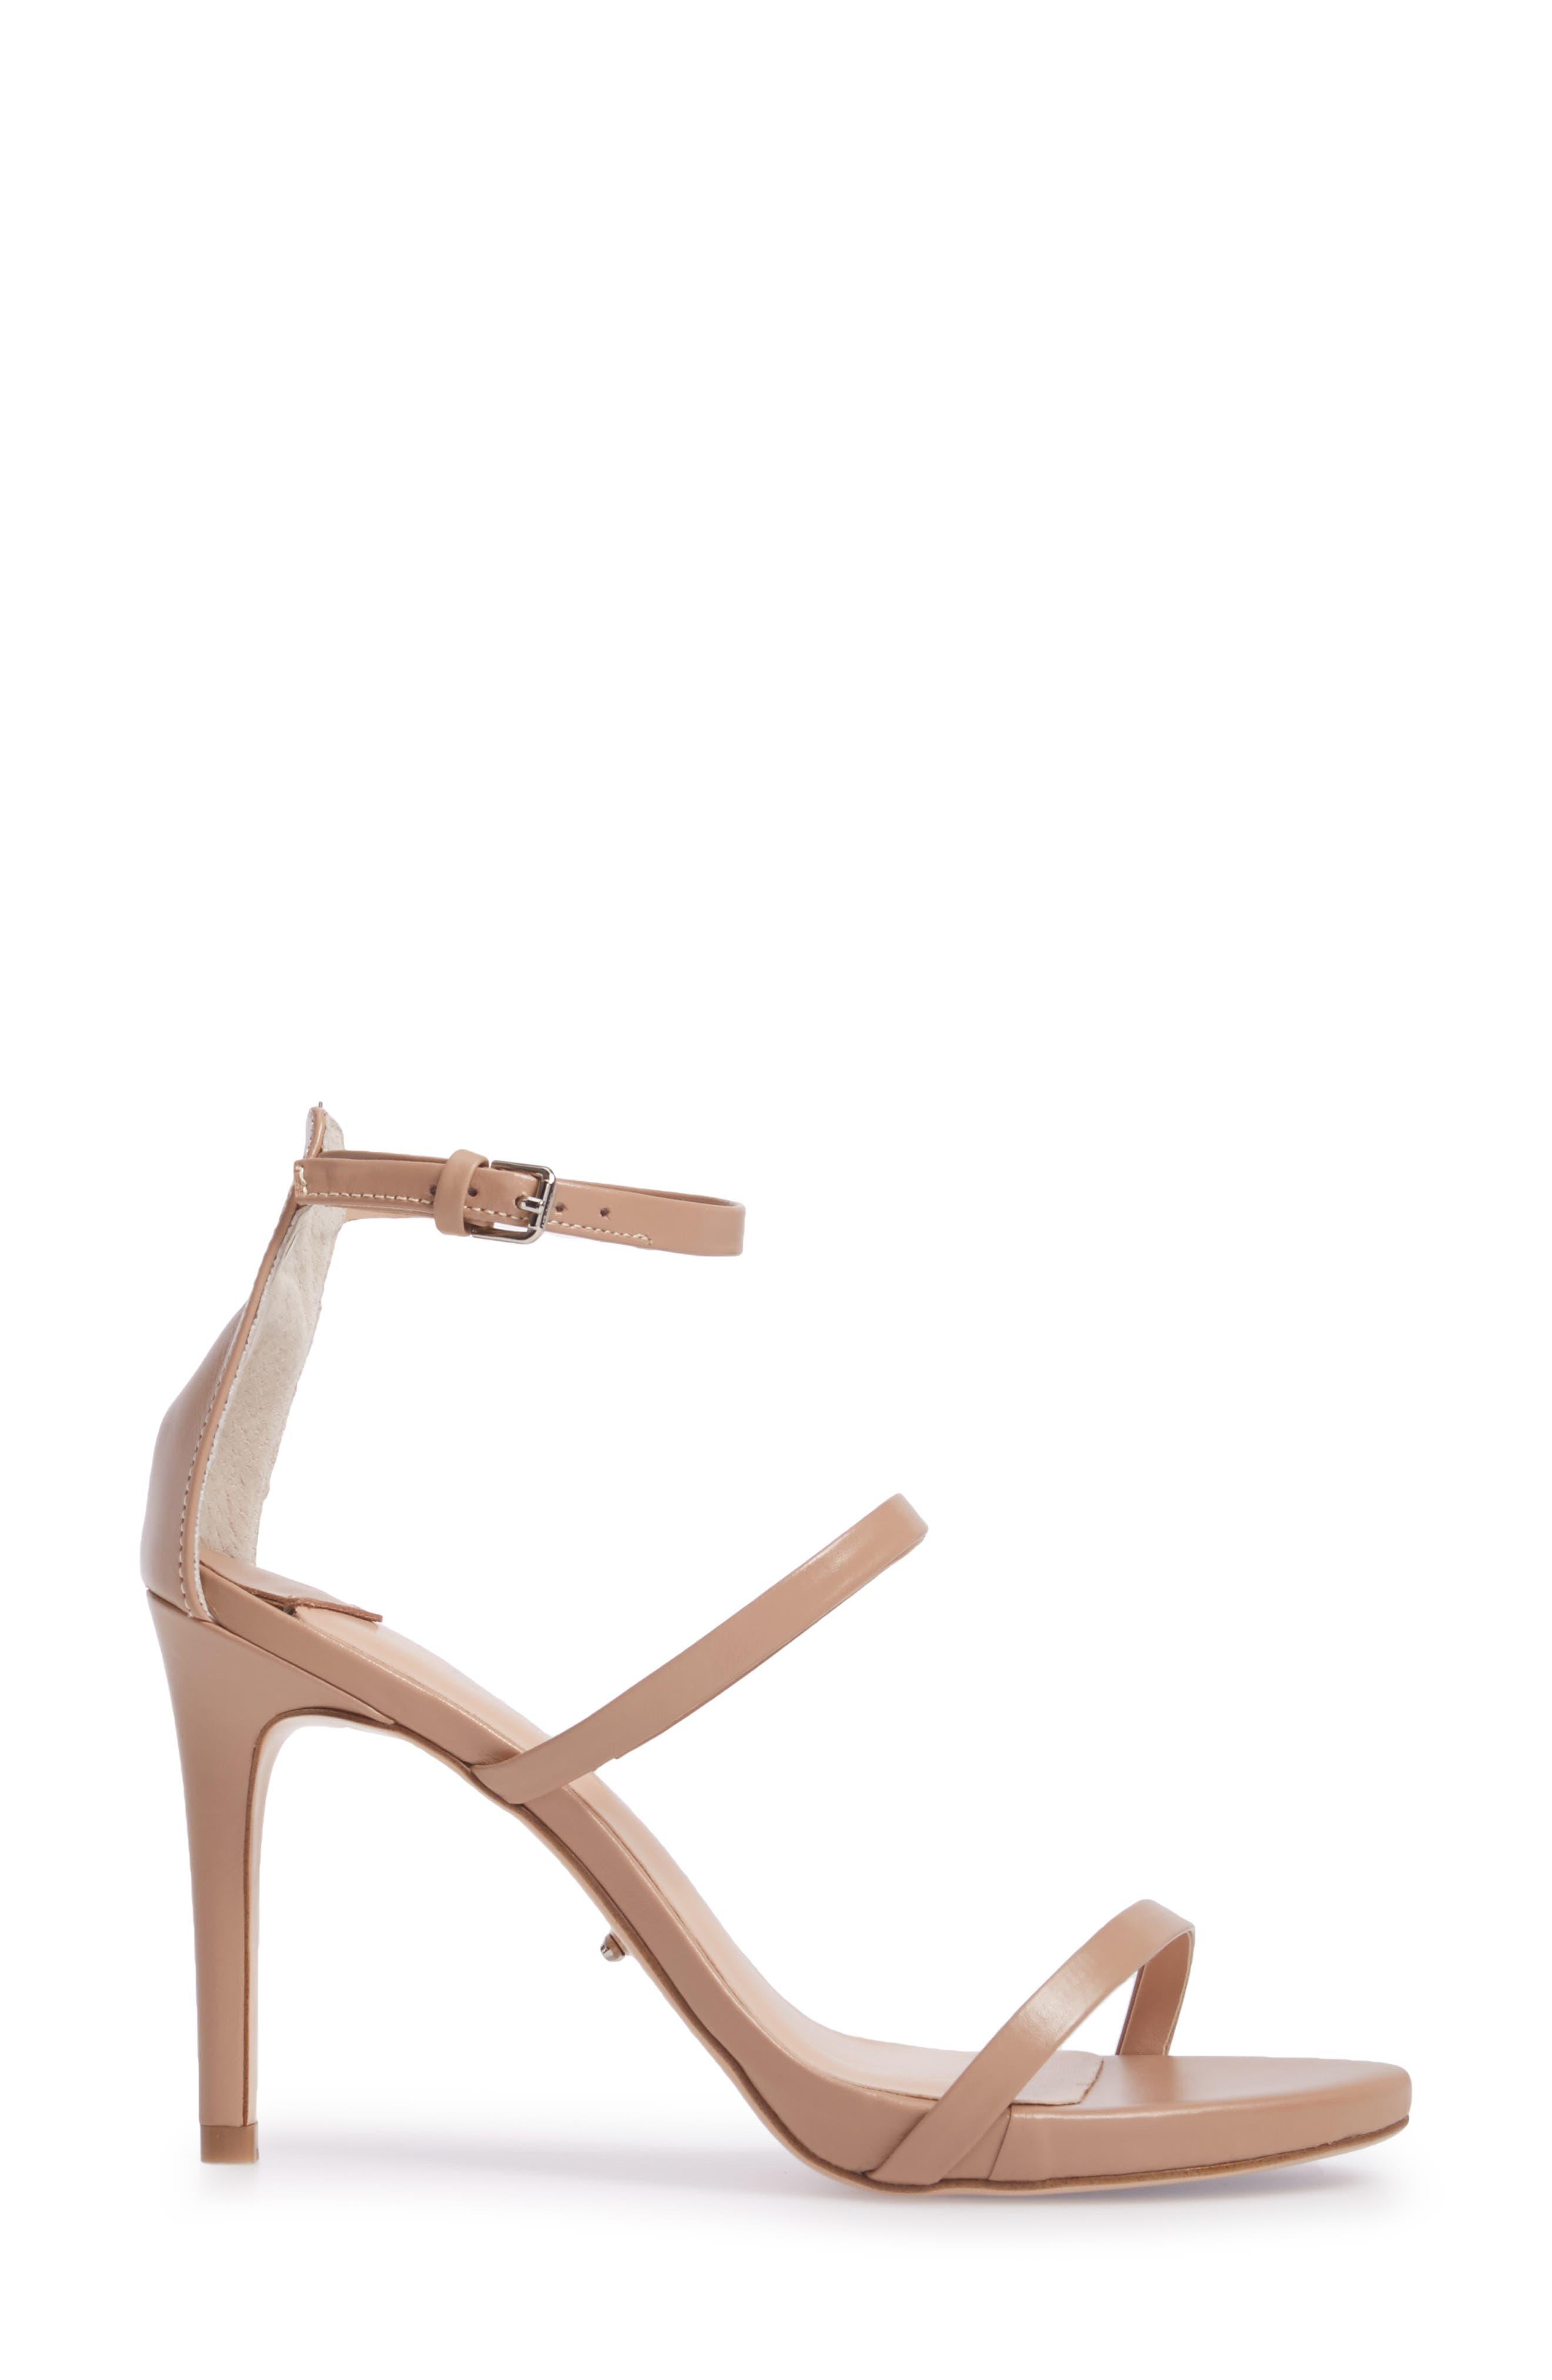 Carey Three-Strap Sandal,                             Alternate thumbnail 3, color,                             Skin Capretto Leather